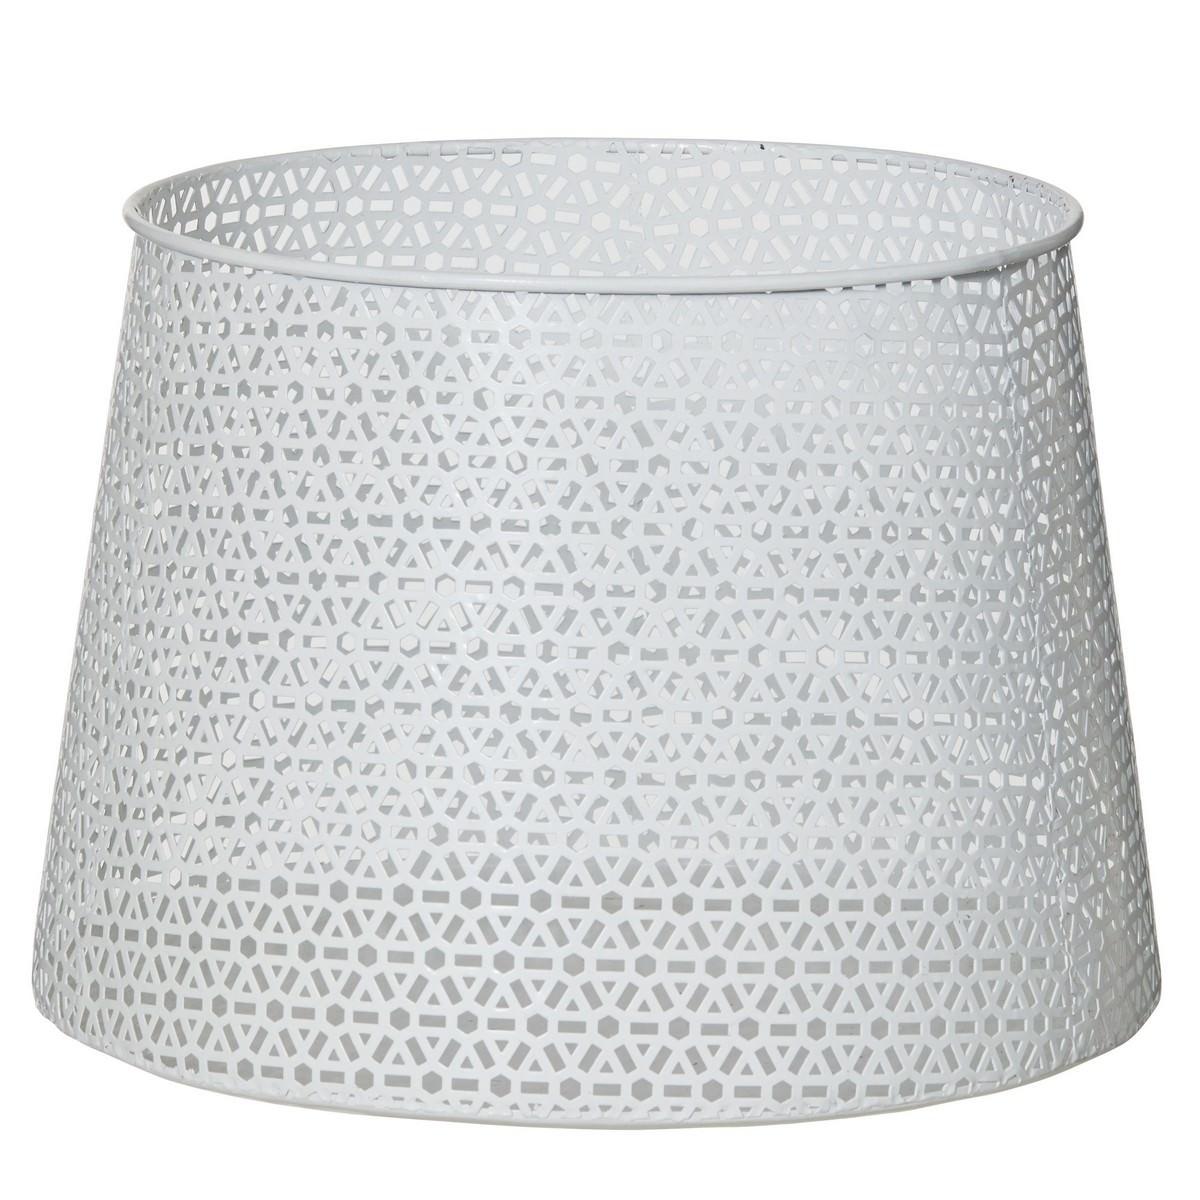 Arielle Metal Pot, Large